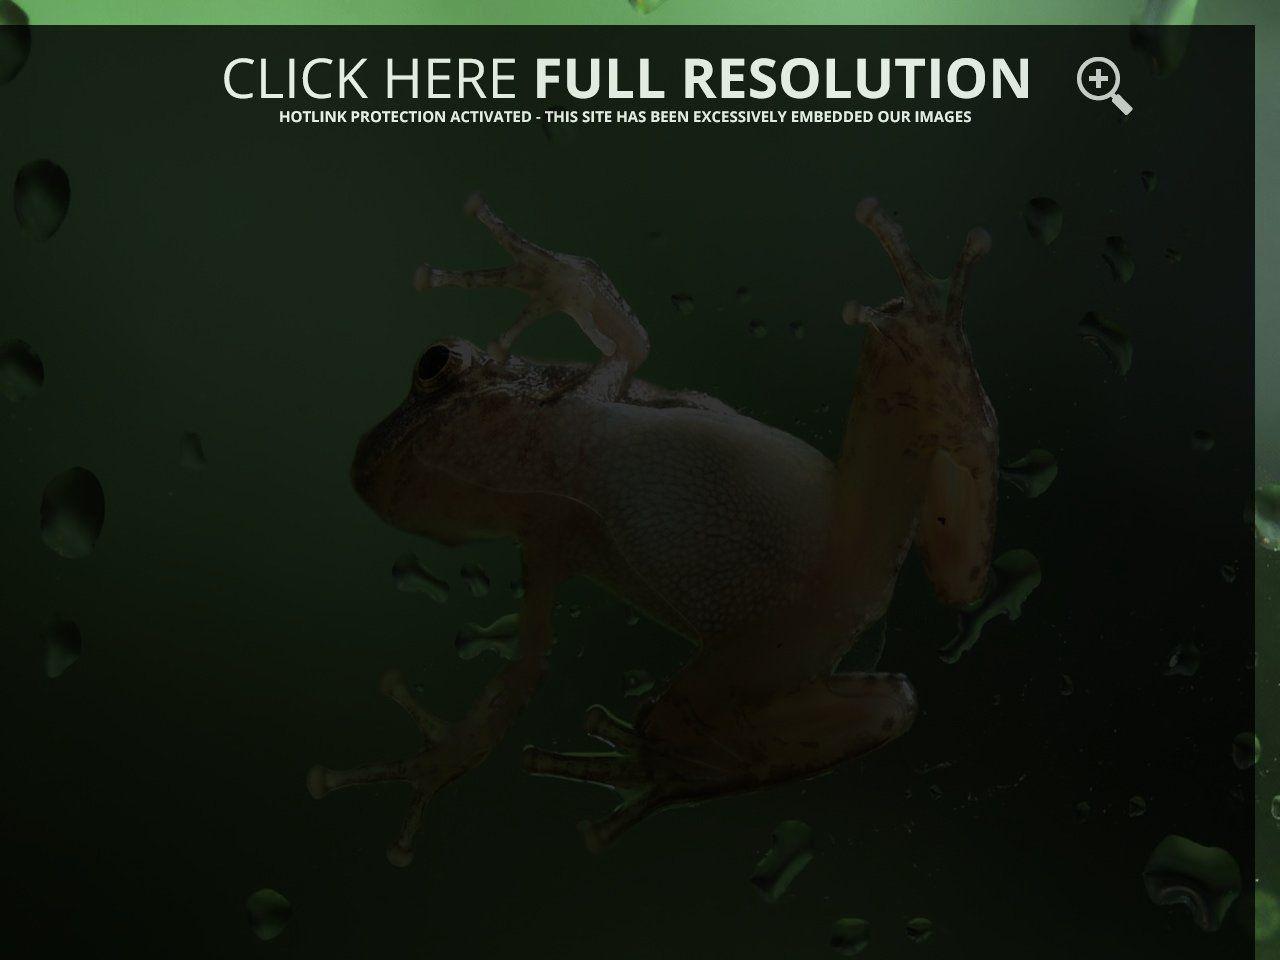 frog-on-glass.jpg (1280×960)